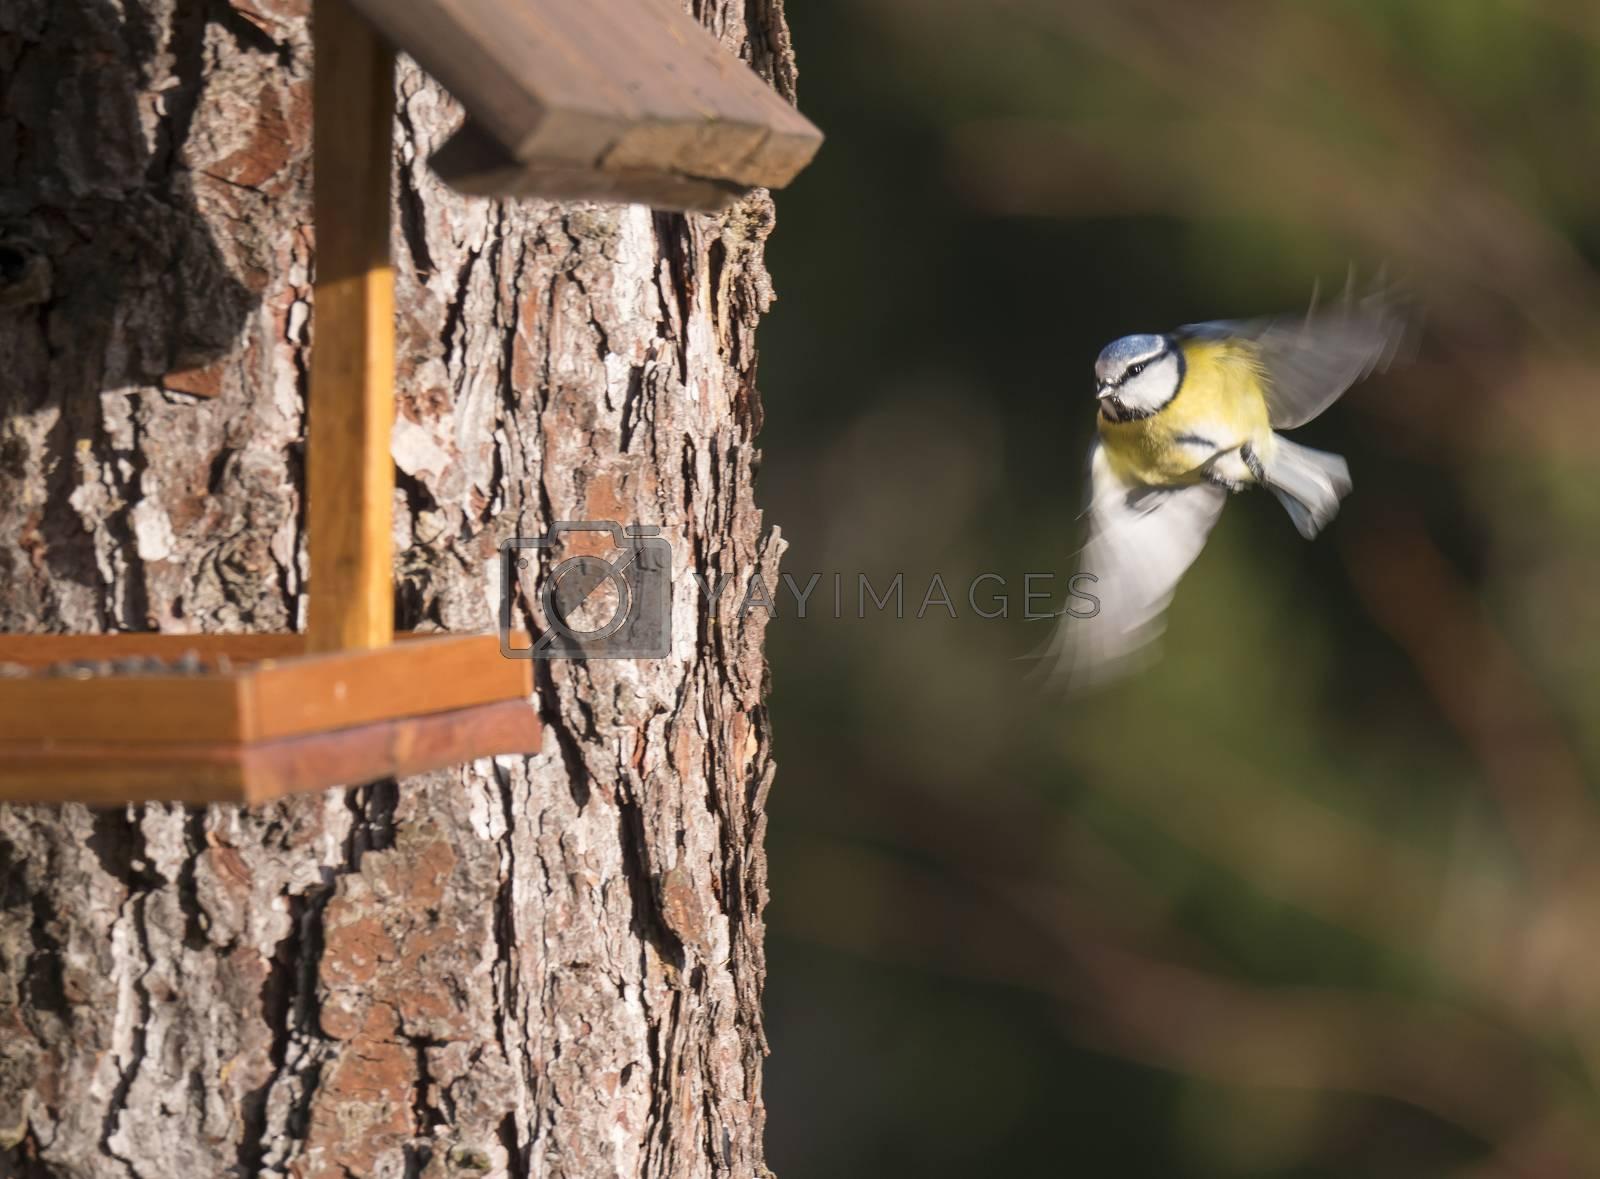 Eurasian blue tit, Cyanistes caeruleus bird in flight, flying to bird feeder table. Bird feeding concept. Selective focus. Motion blur.